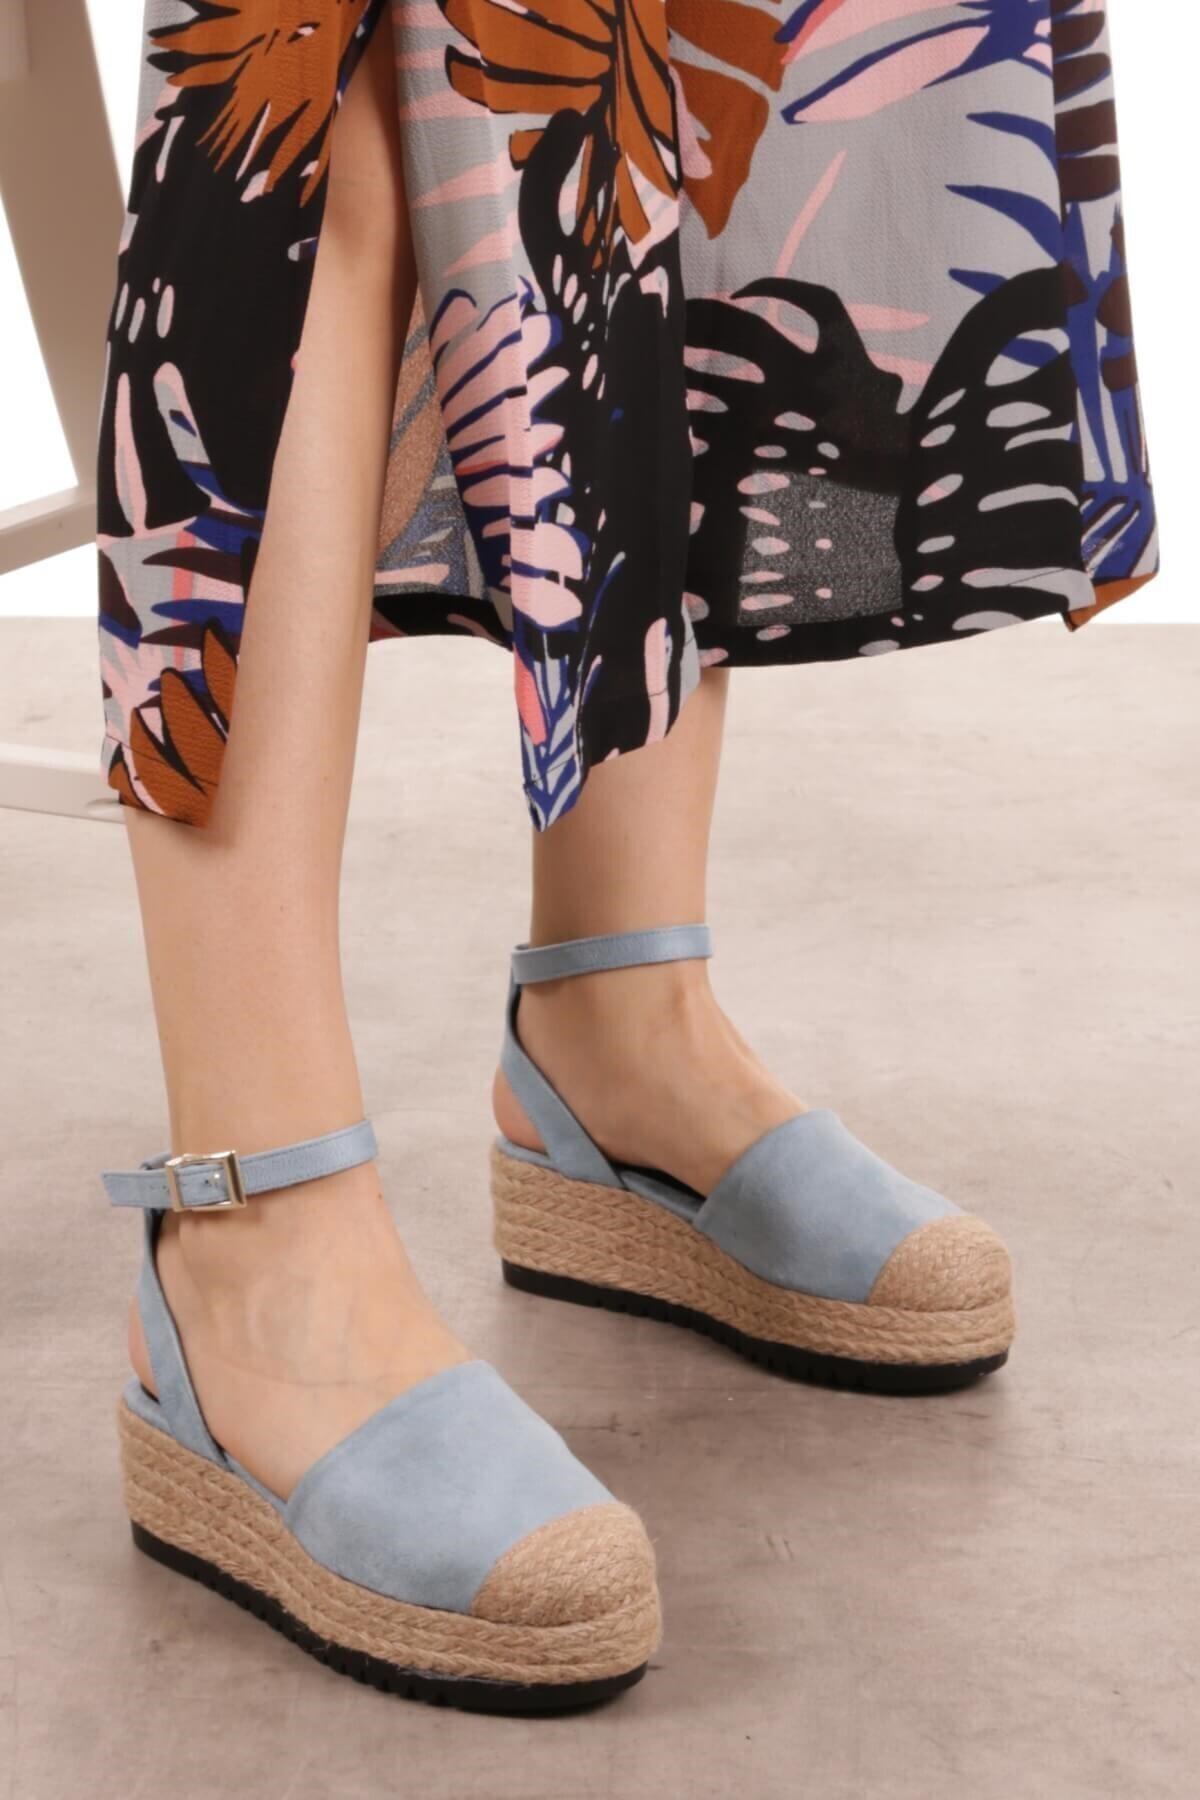 Mio Gusto Janet Mavi Dolgu Tabanlı Sandalet 2